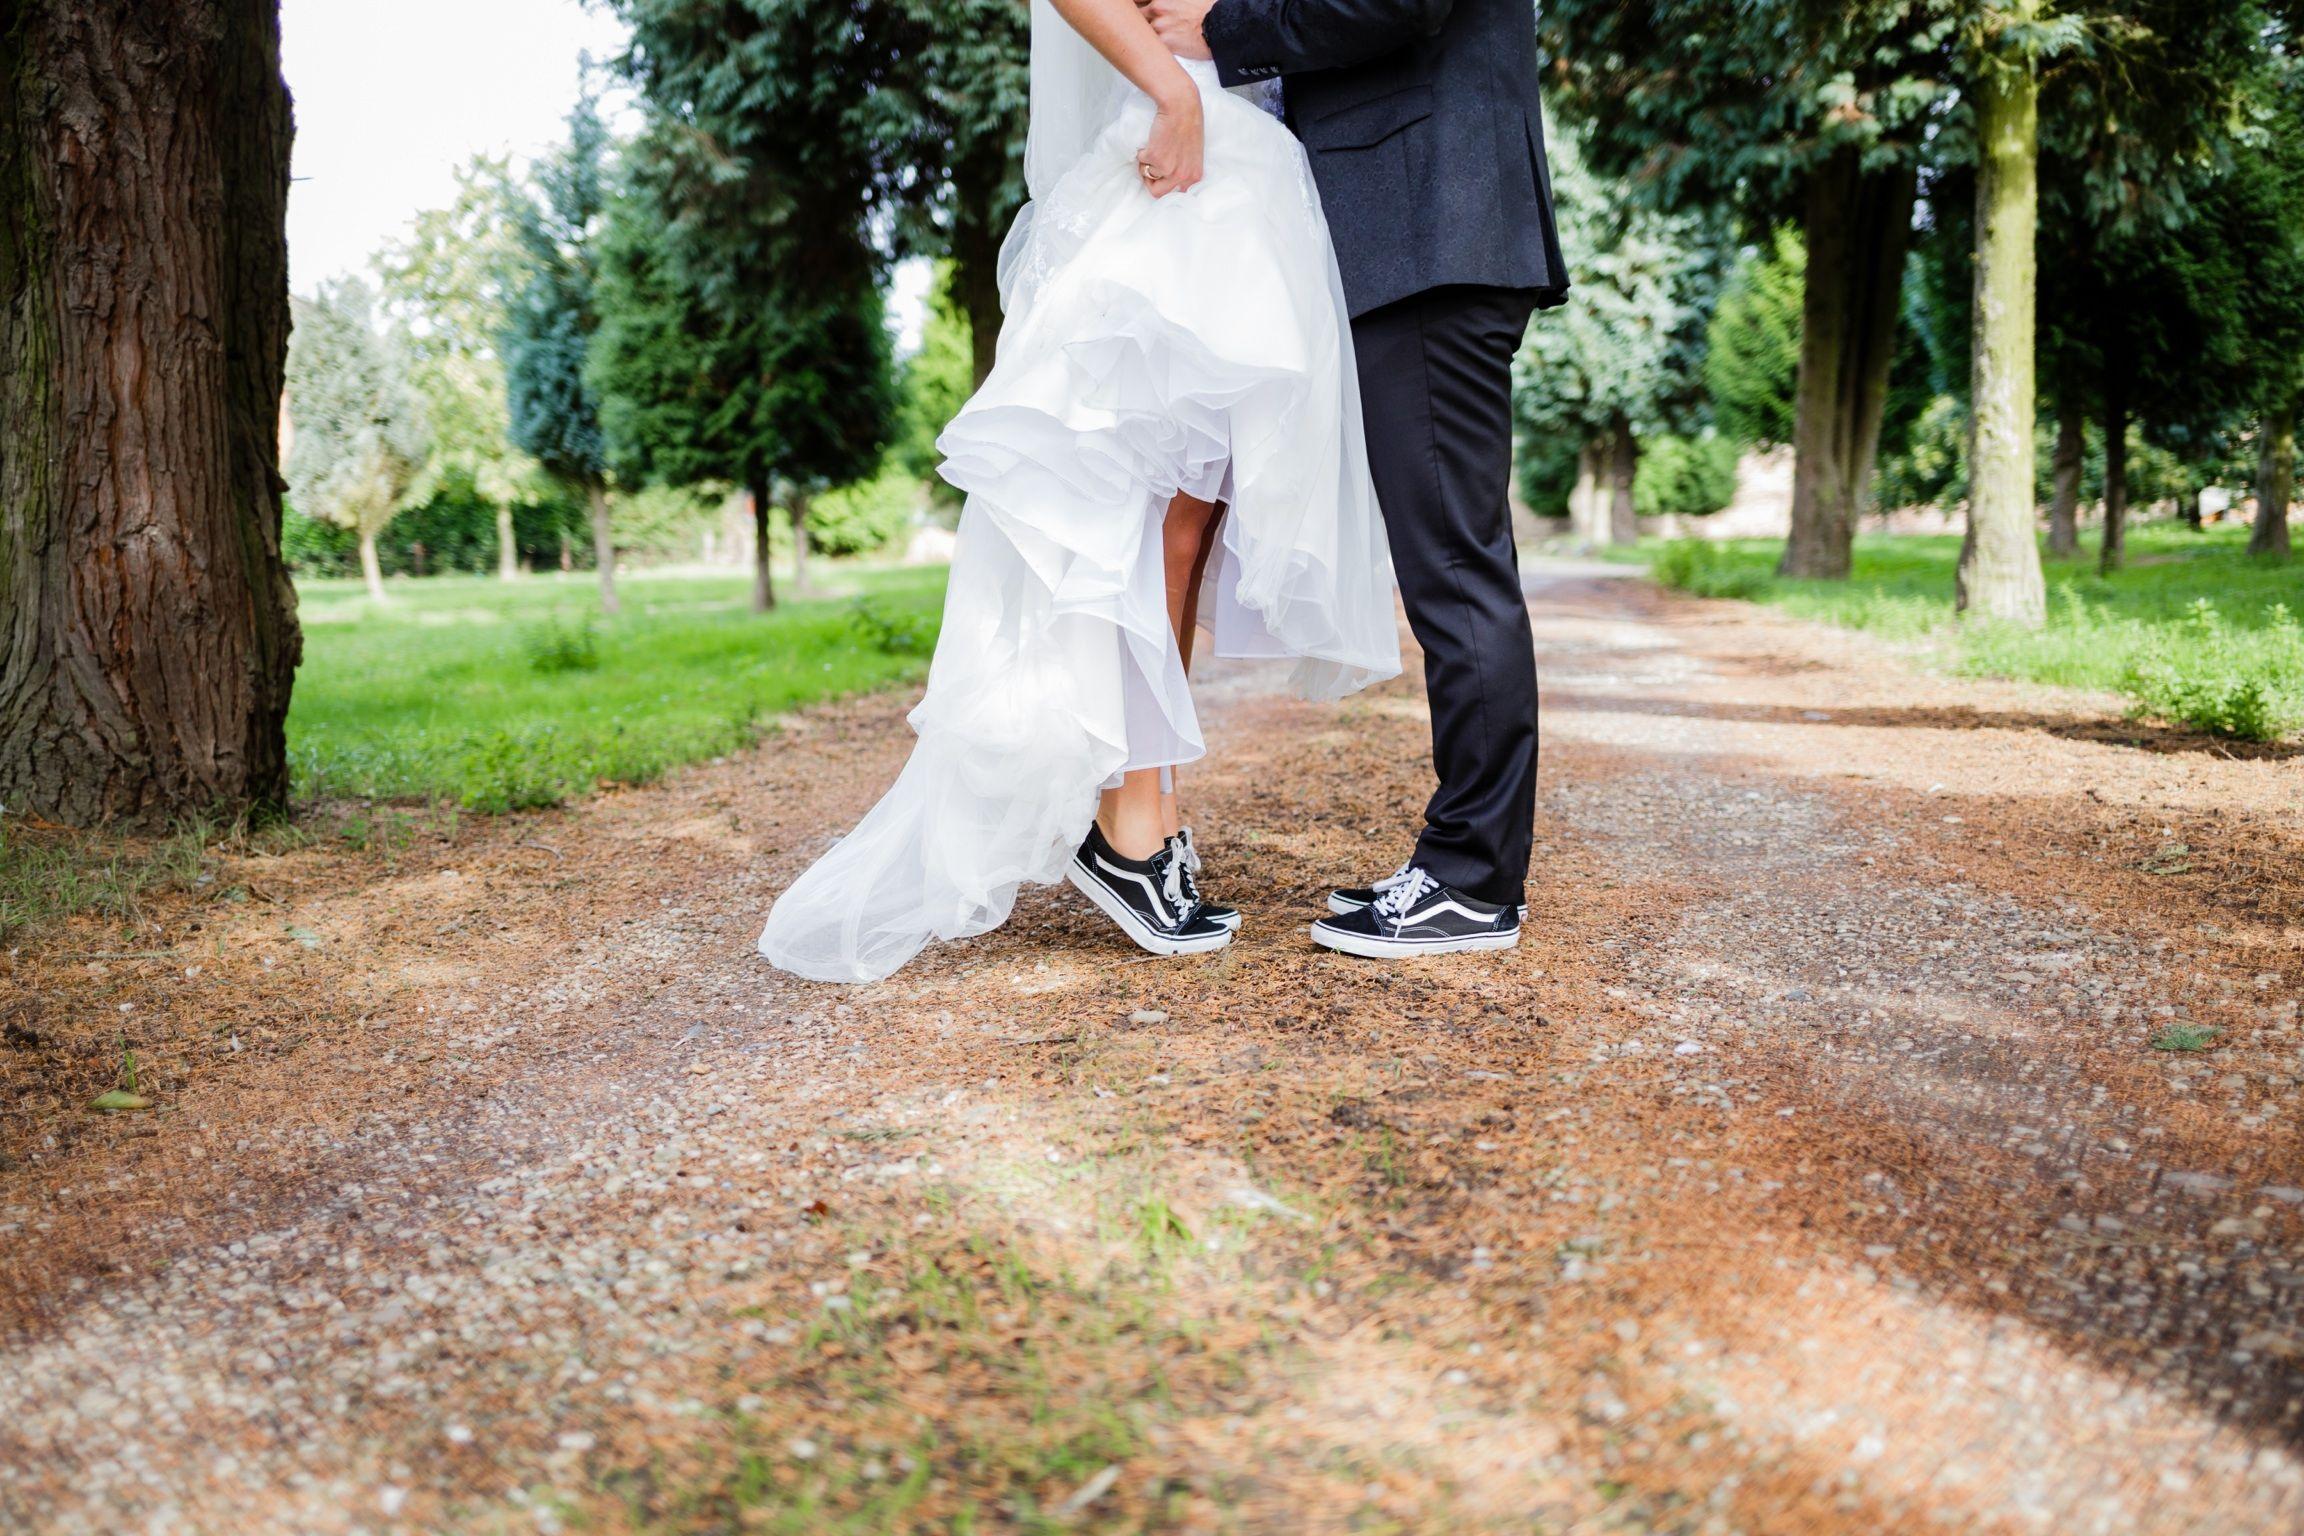 Wedding Vans Shooting | Wedding vans, Vegas wedding, Wedding pics